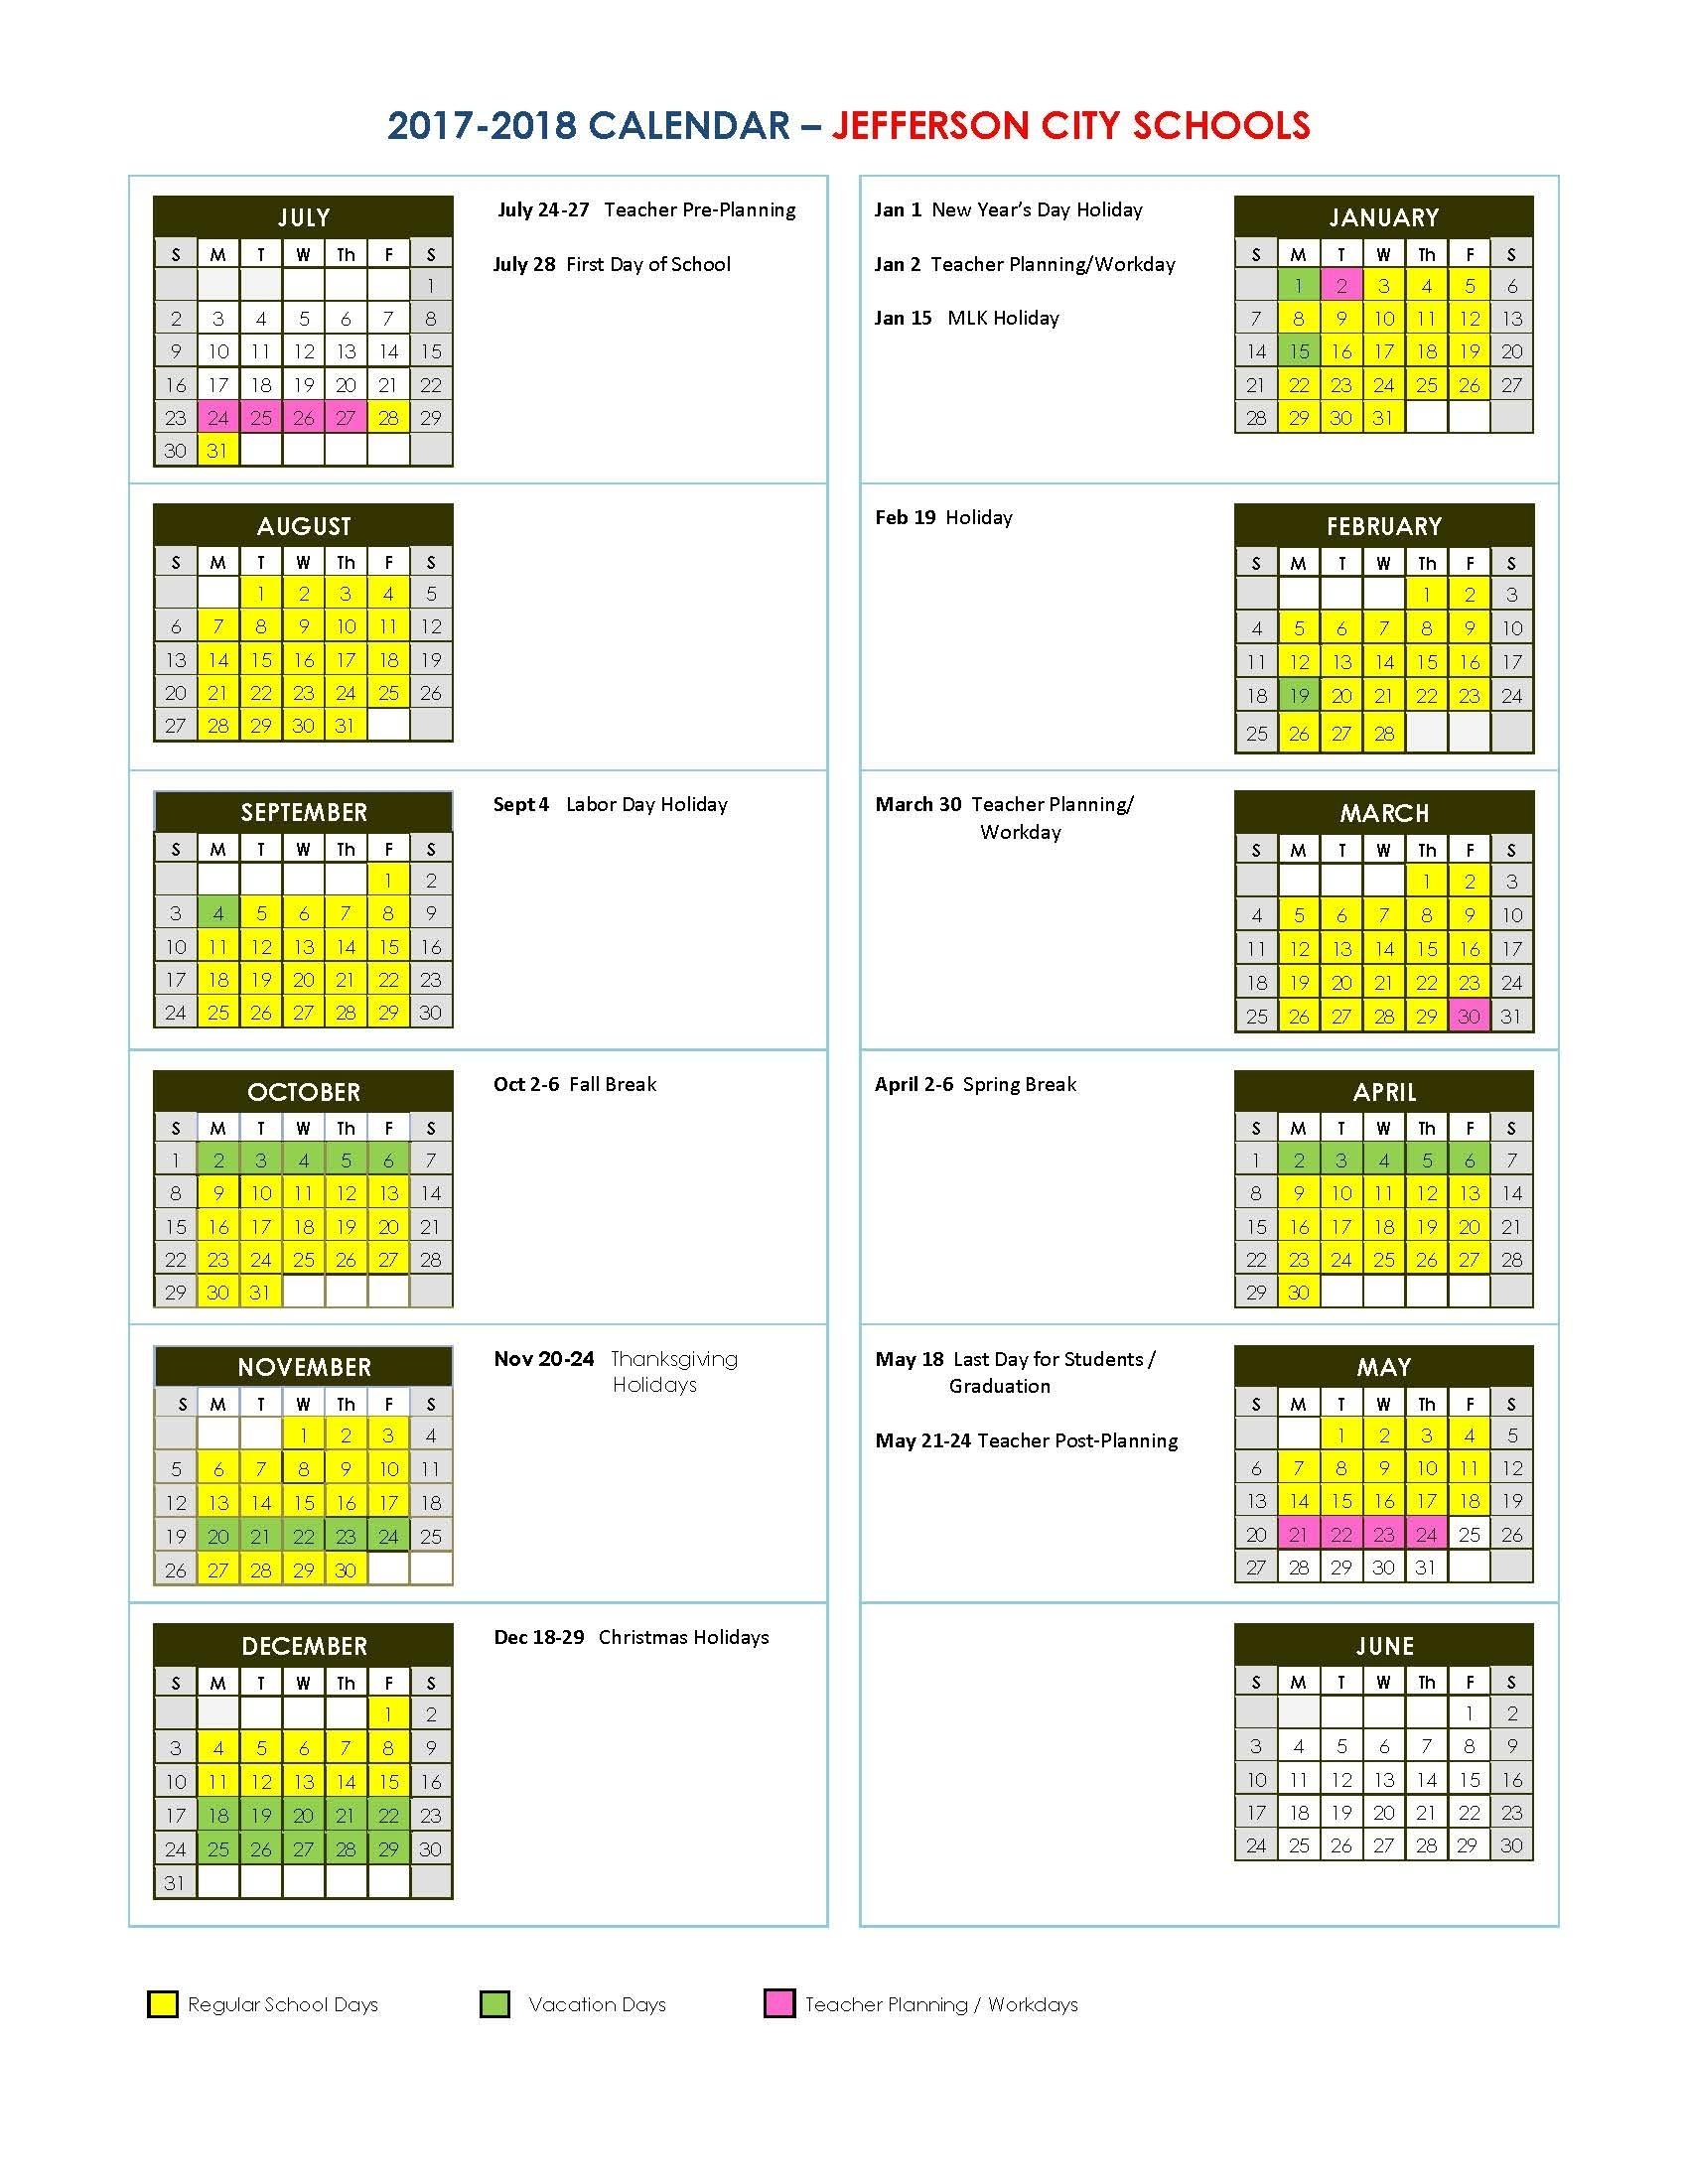 Jefferson City Schools intended for Uga 2019/2020 School Calendar